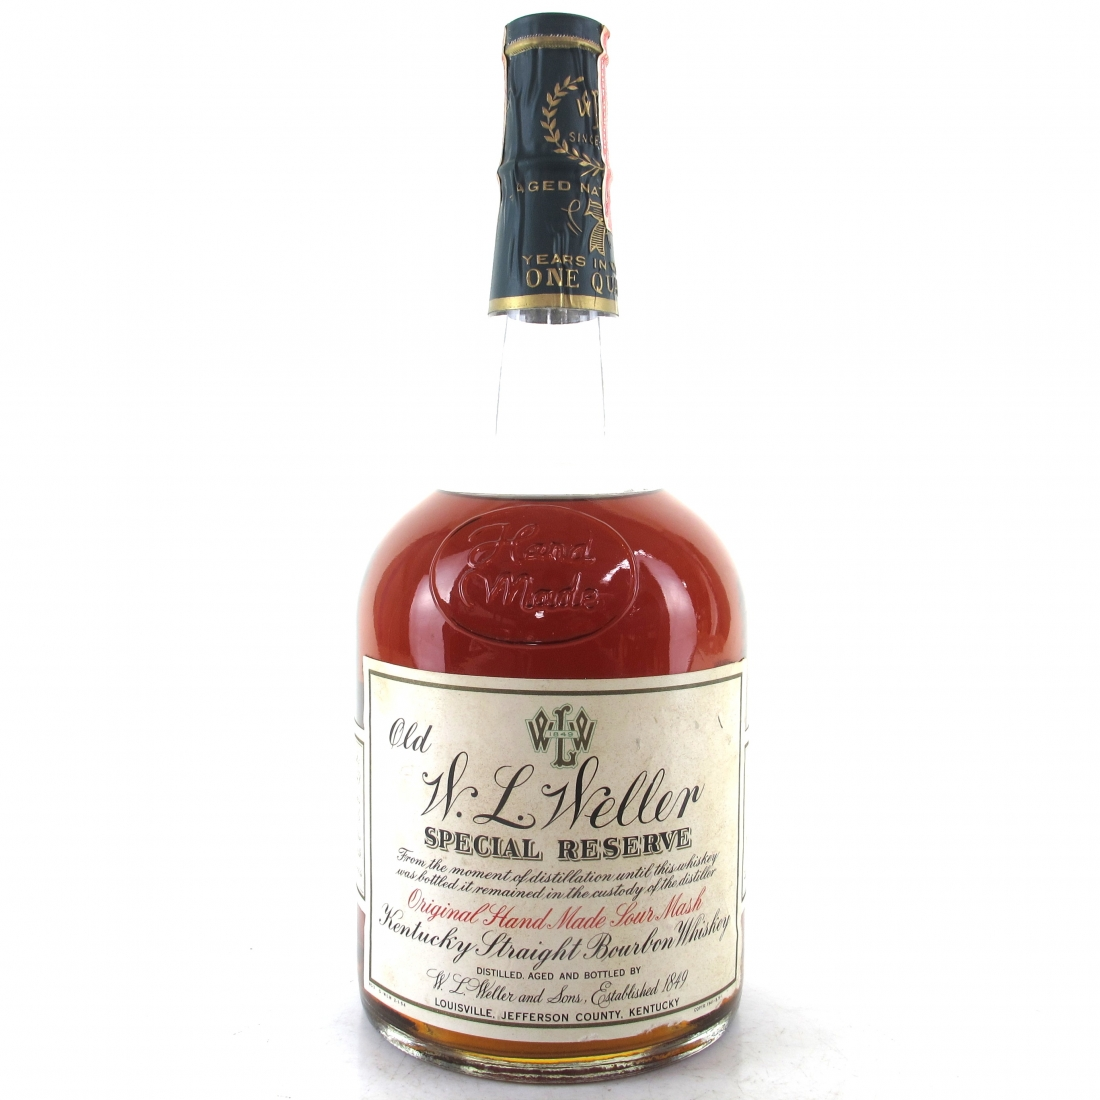 Old W.L. Weller 7 Year Old Special Reserve 1 Quart 1971 / Stitzel-Weller